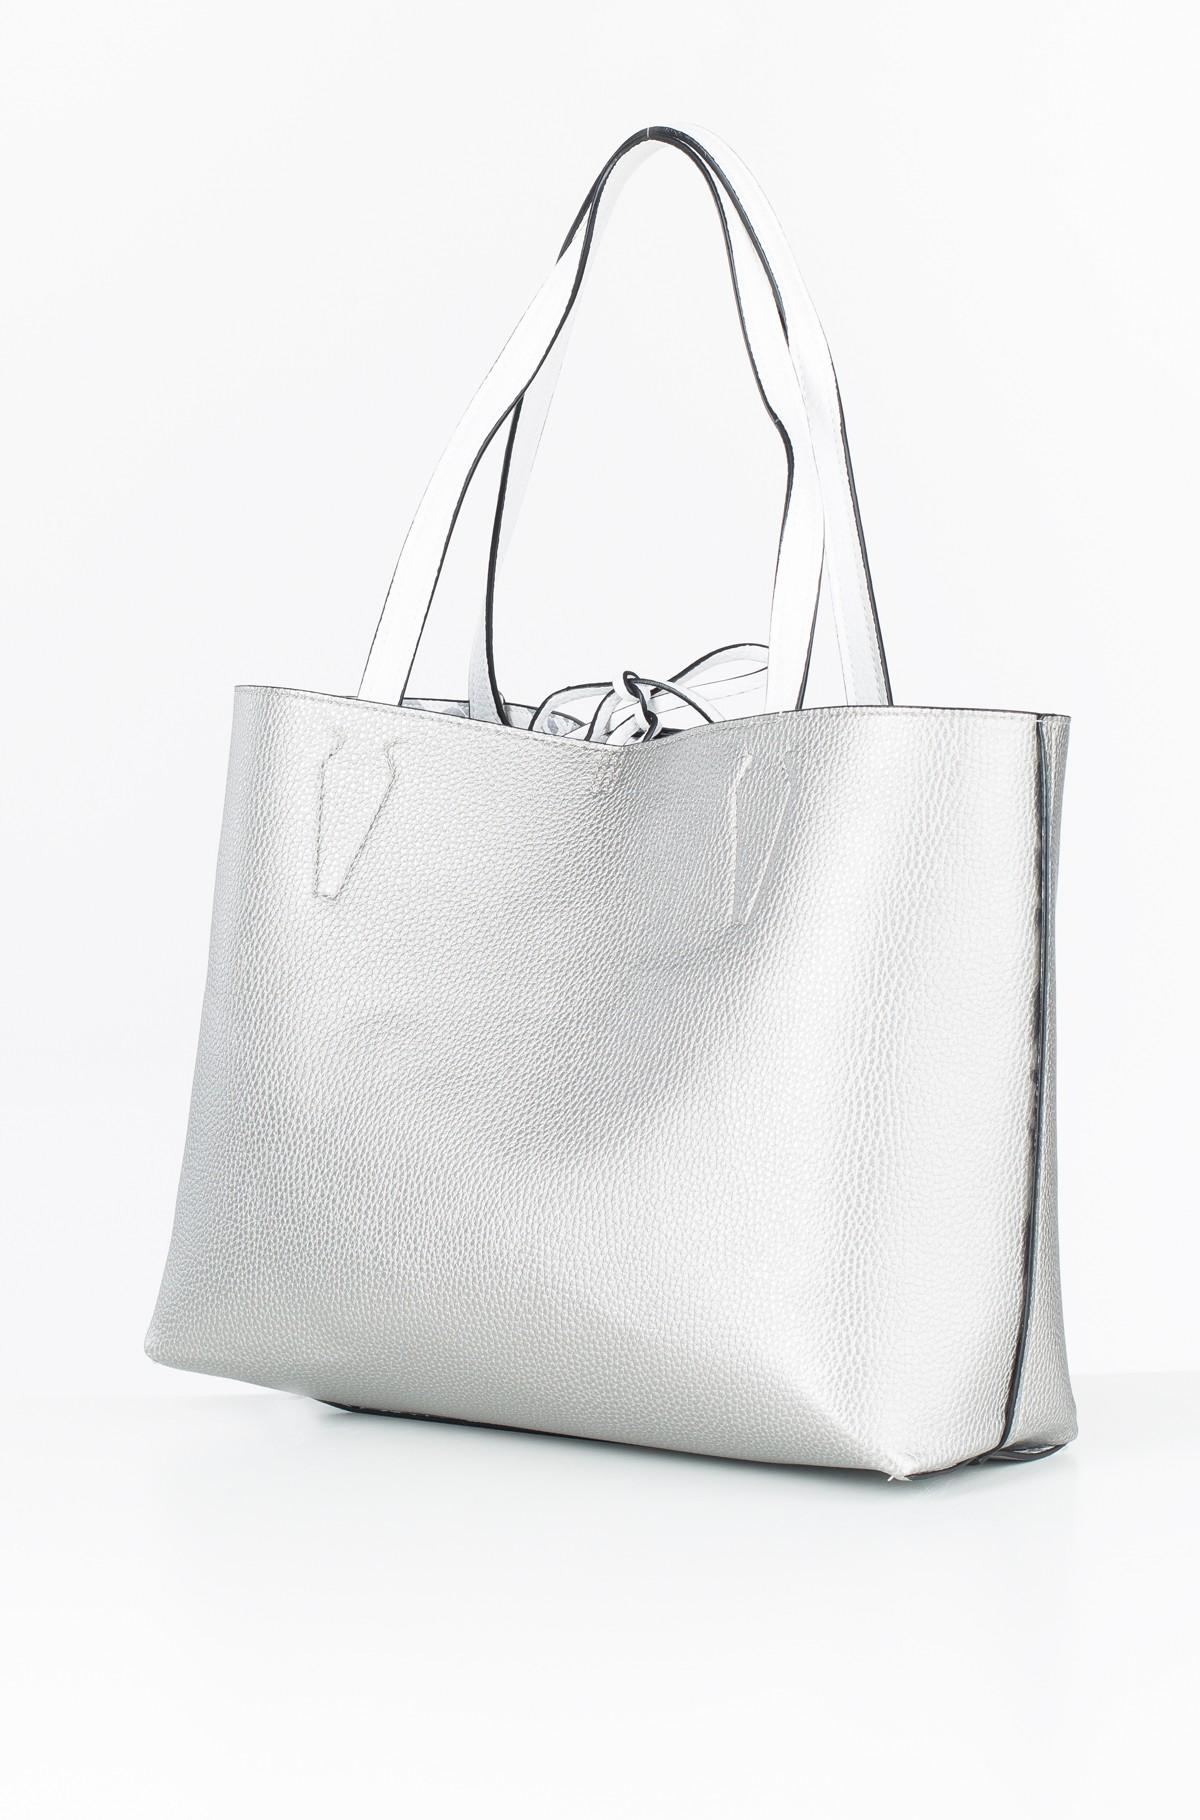 Handbag HWAC64 22150-full-2